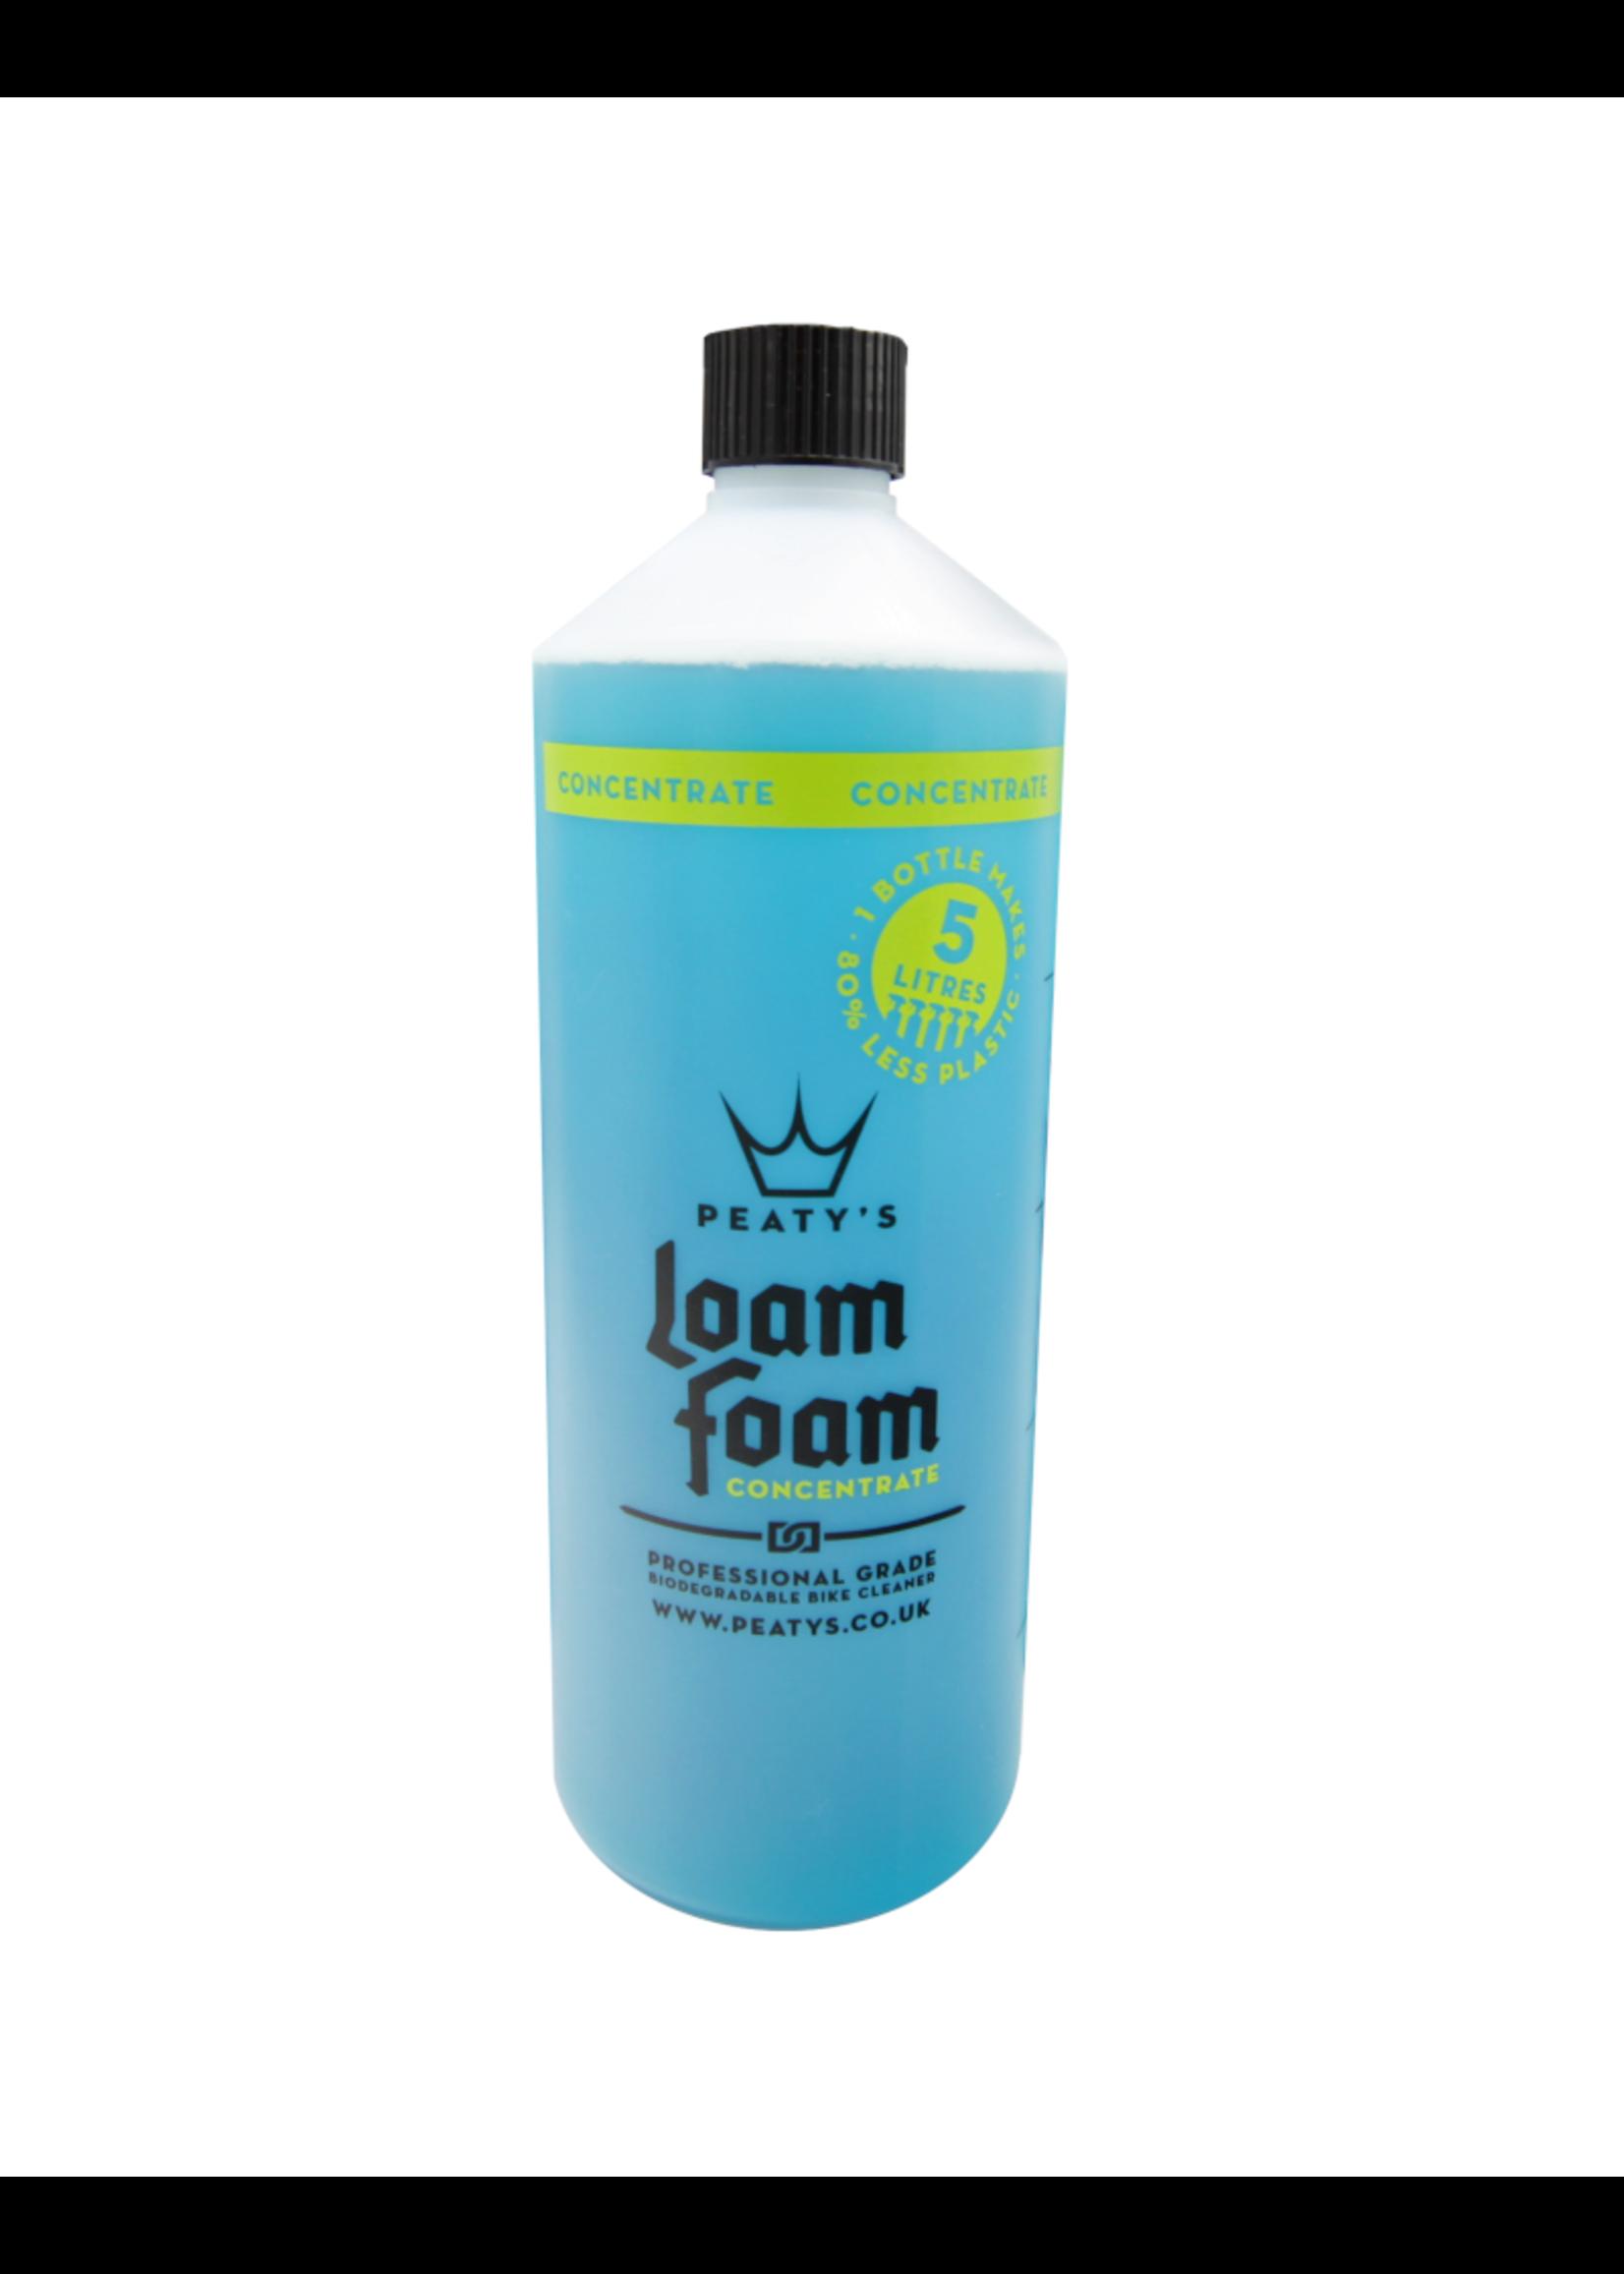 PEATYS Peaty's LOAM FOAM CONCENTRATE CLEANER 1L